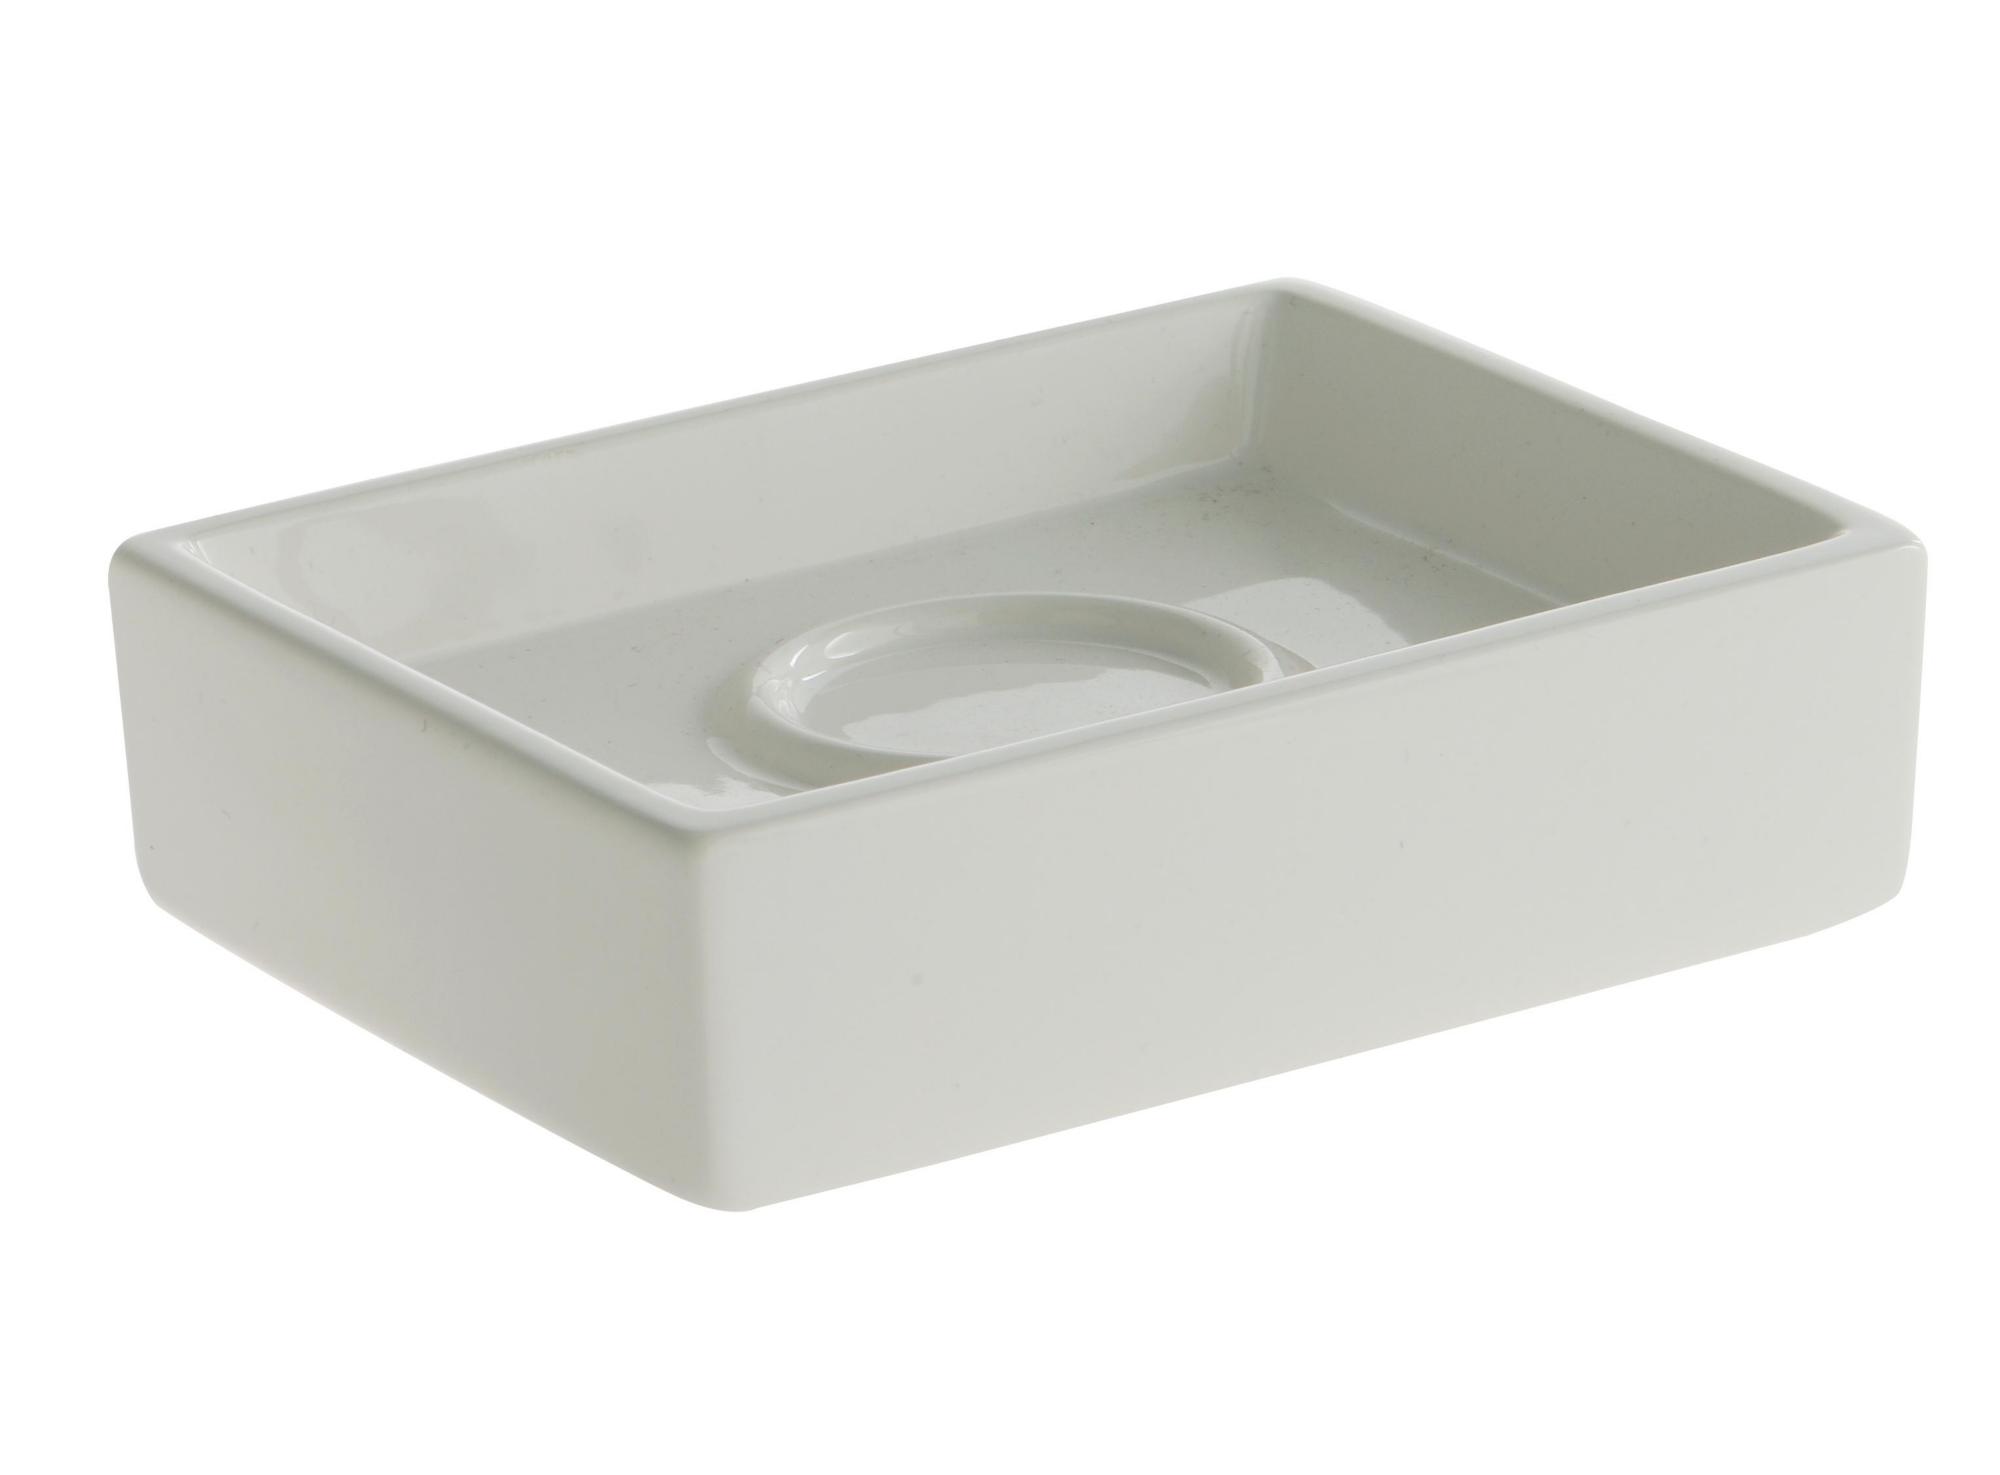 Porte-savon en faience. coloris blanc.